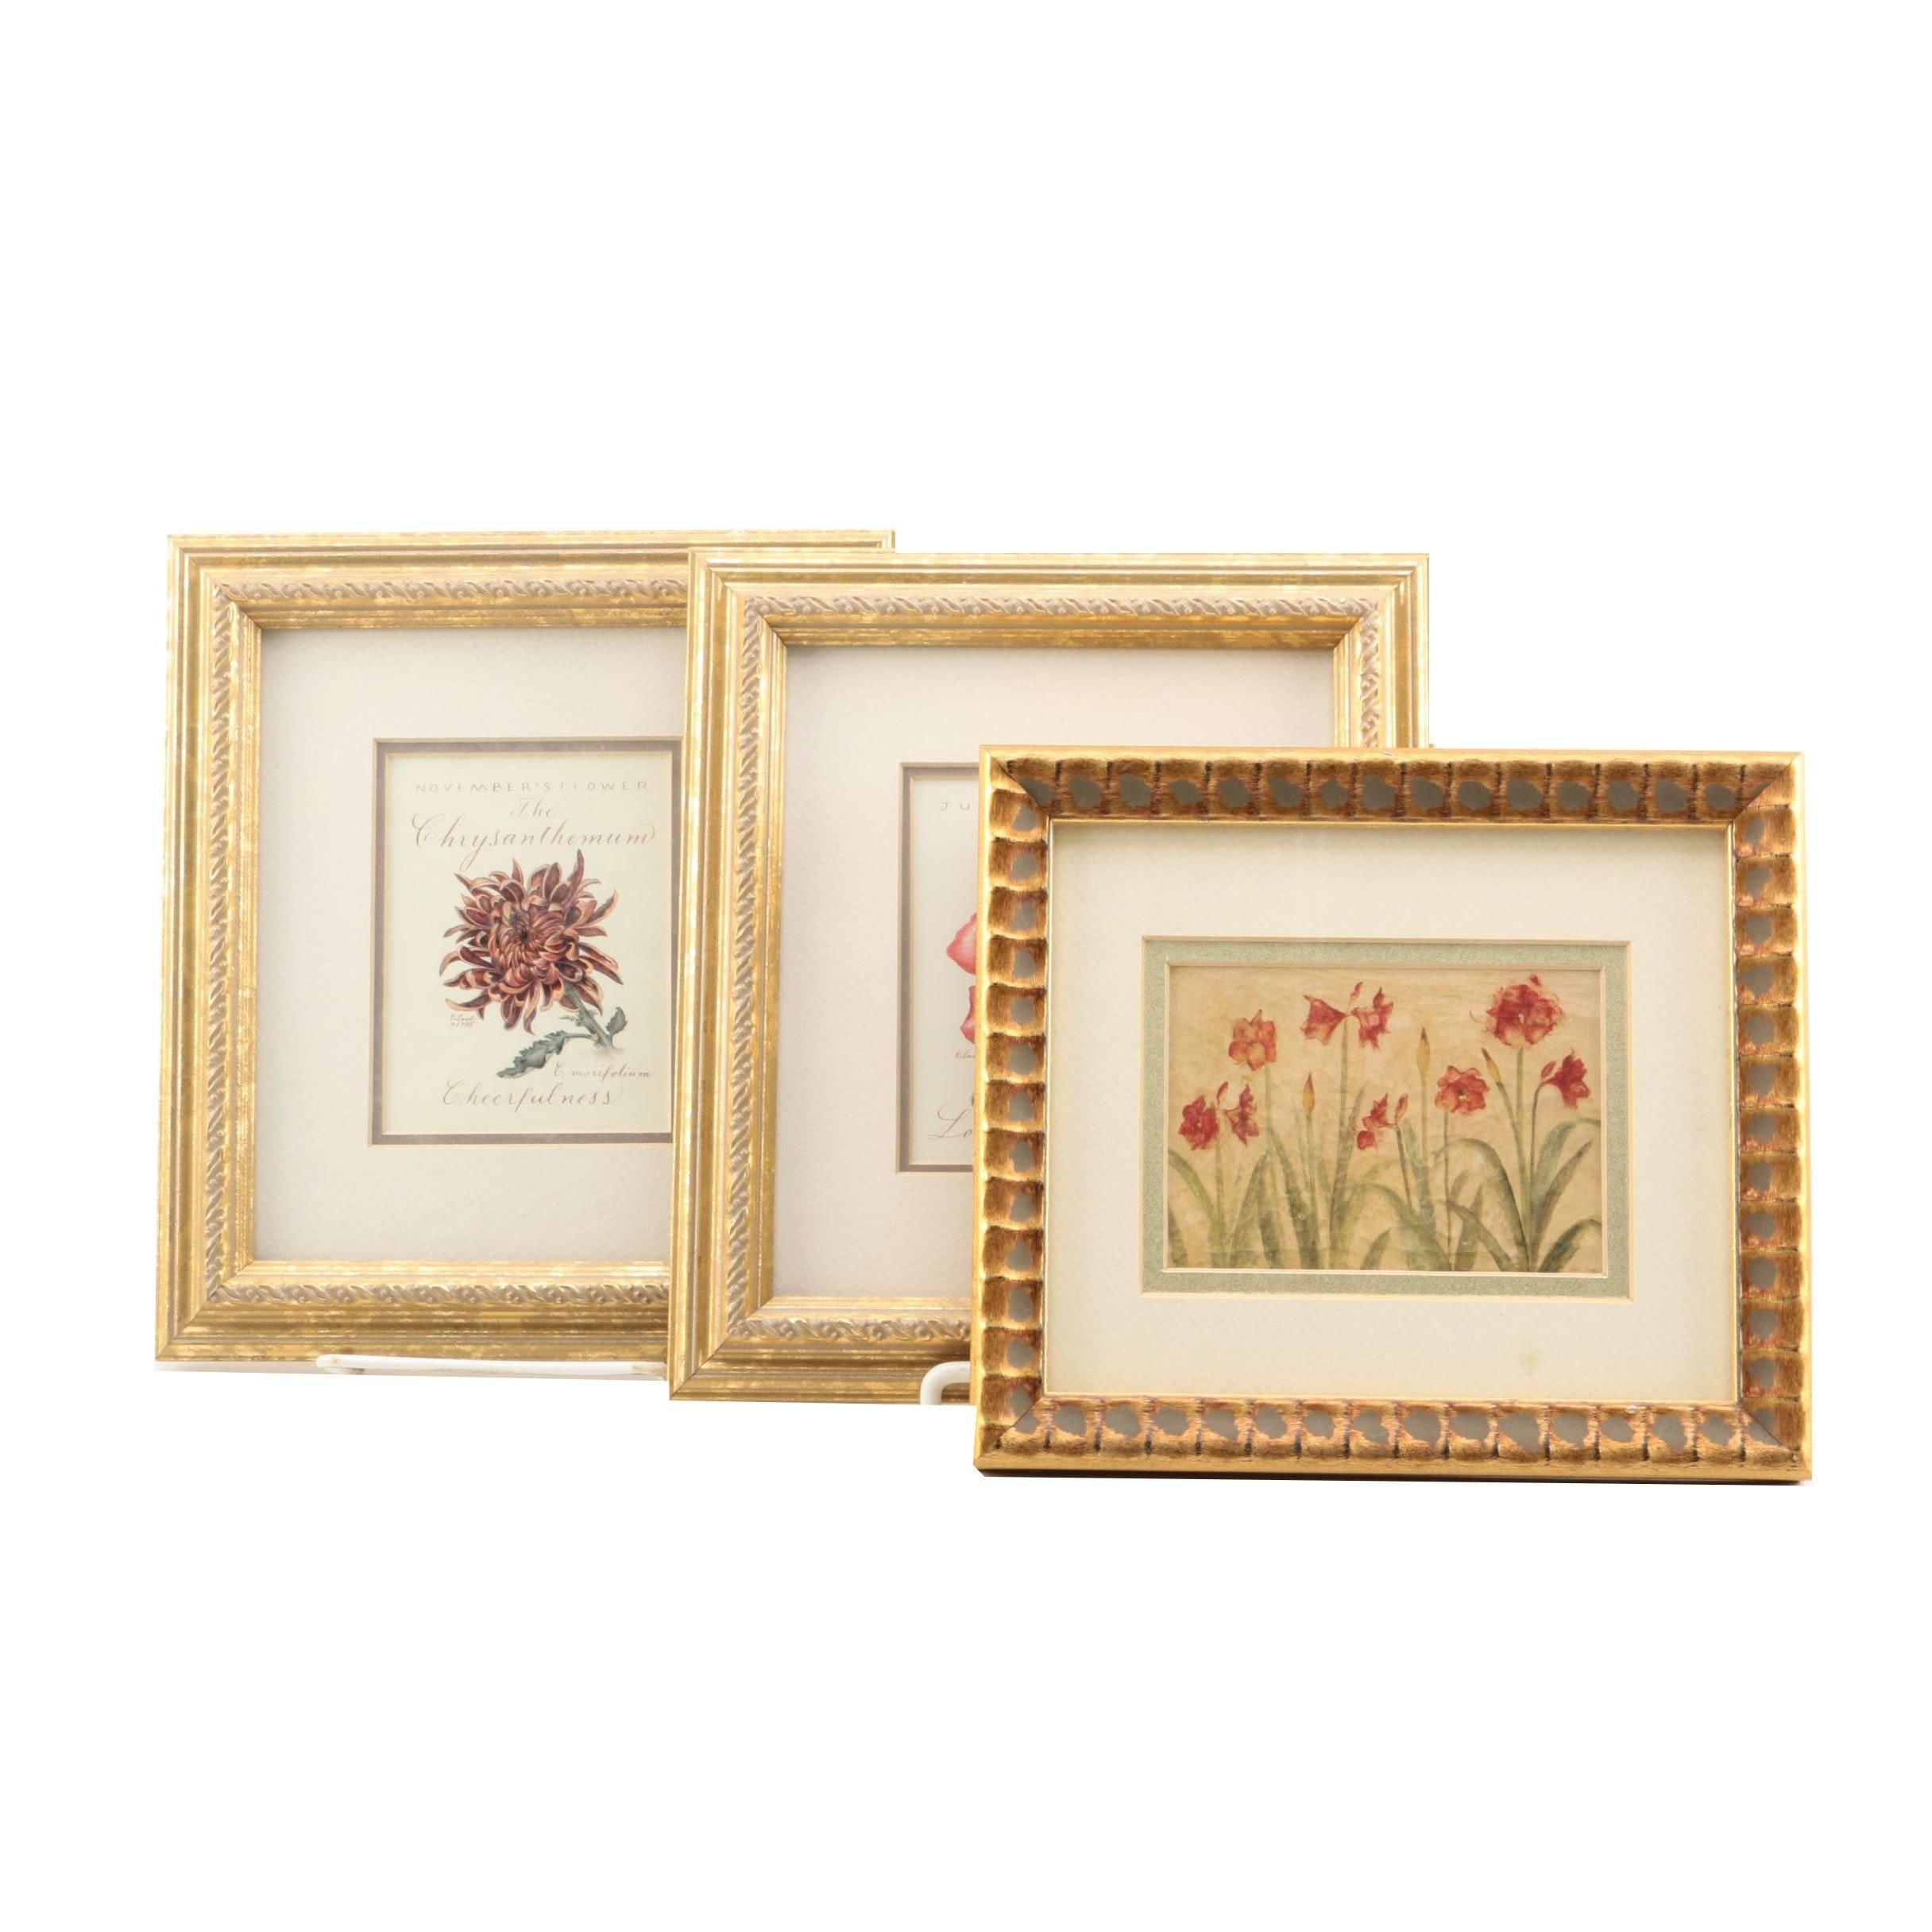 Offset Lithographs on Paper After Floral Illustrations